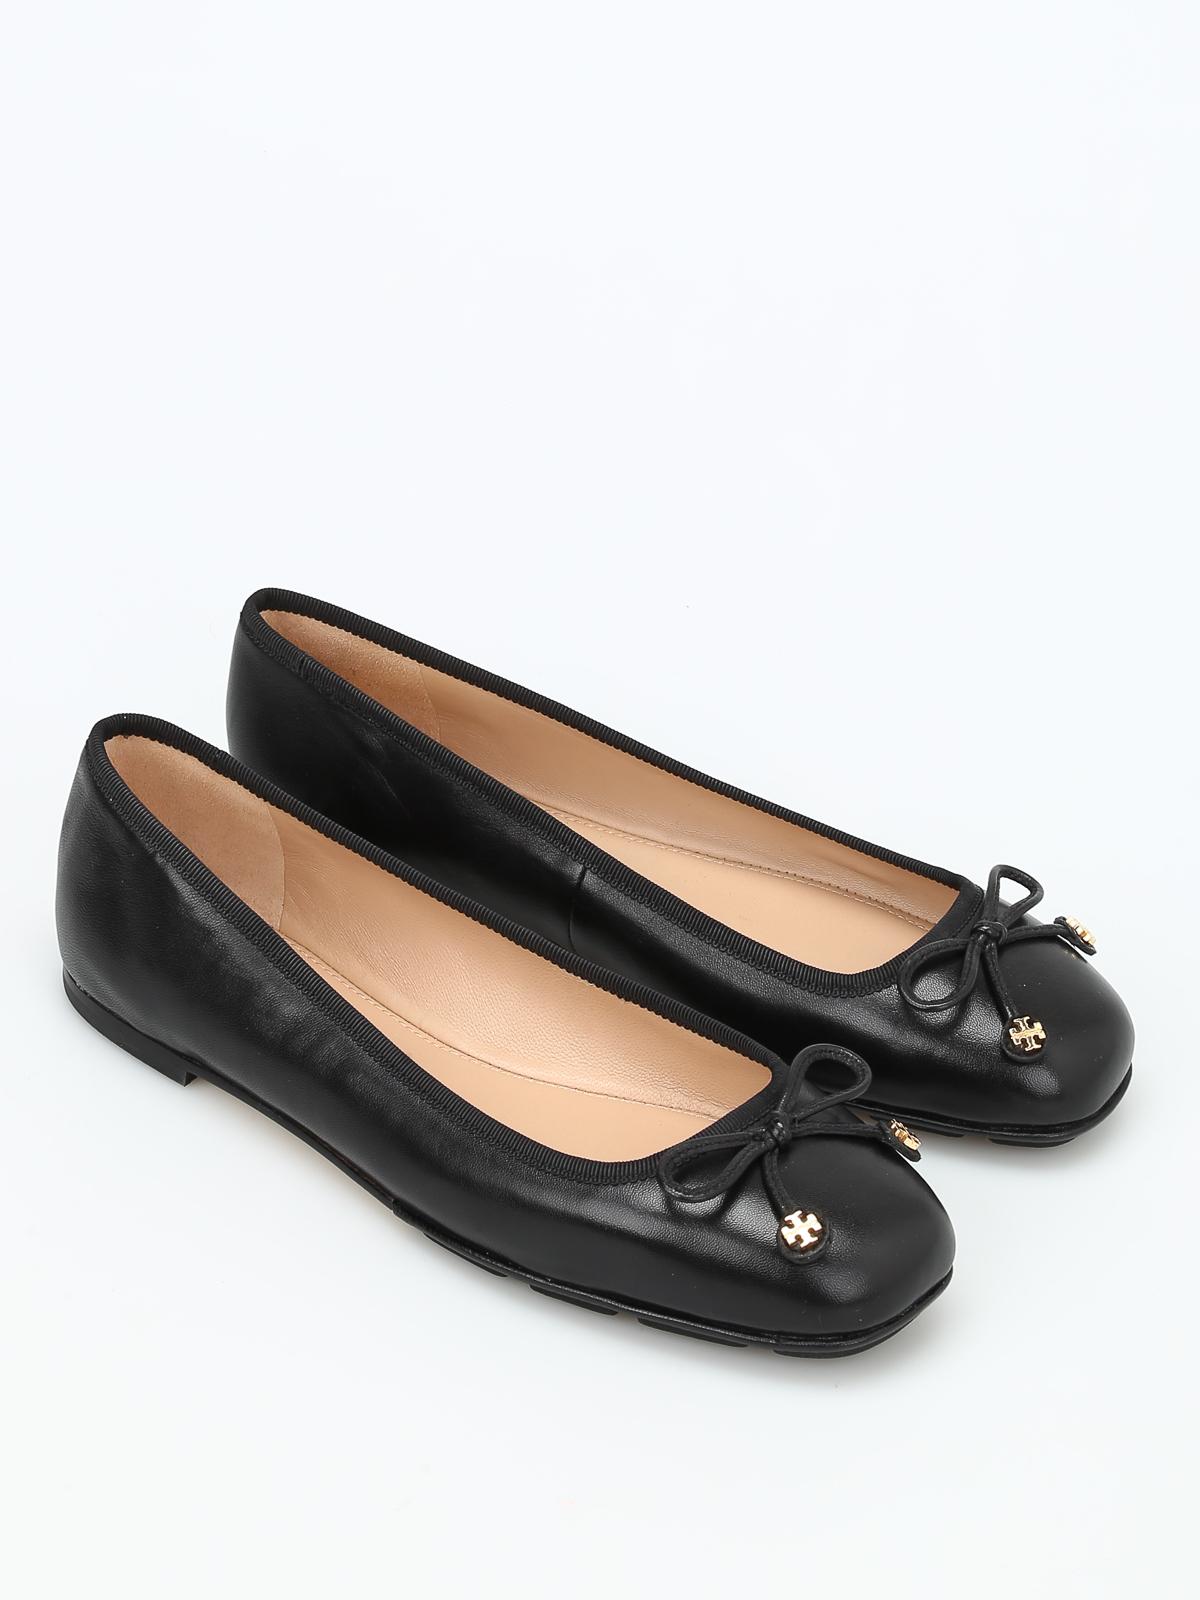 991fad14a Tory Burch - Laila driver ballet flat - flat shoes - 36834 001 ...